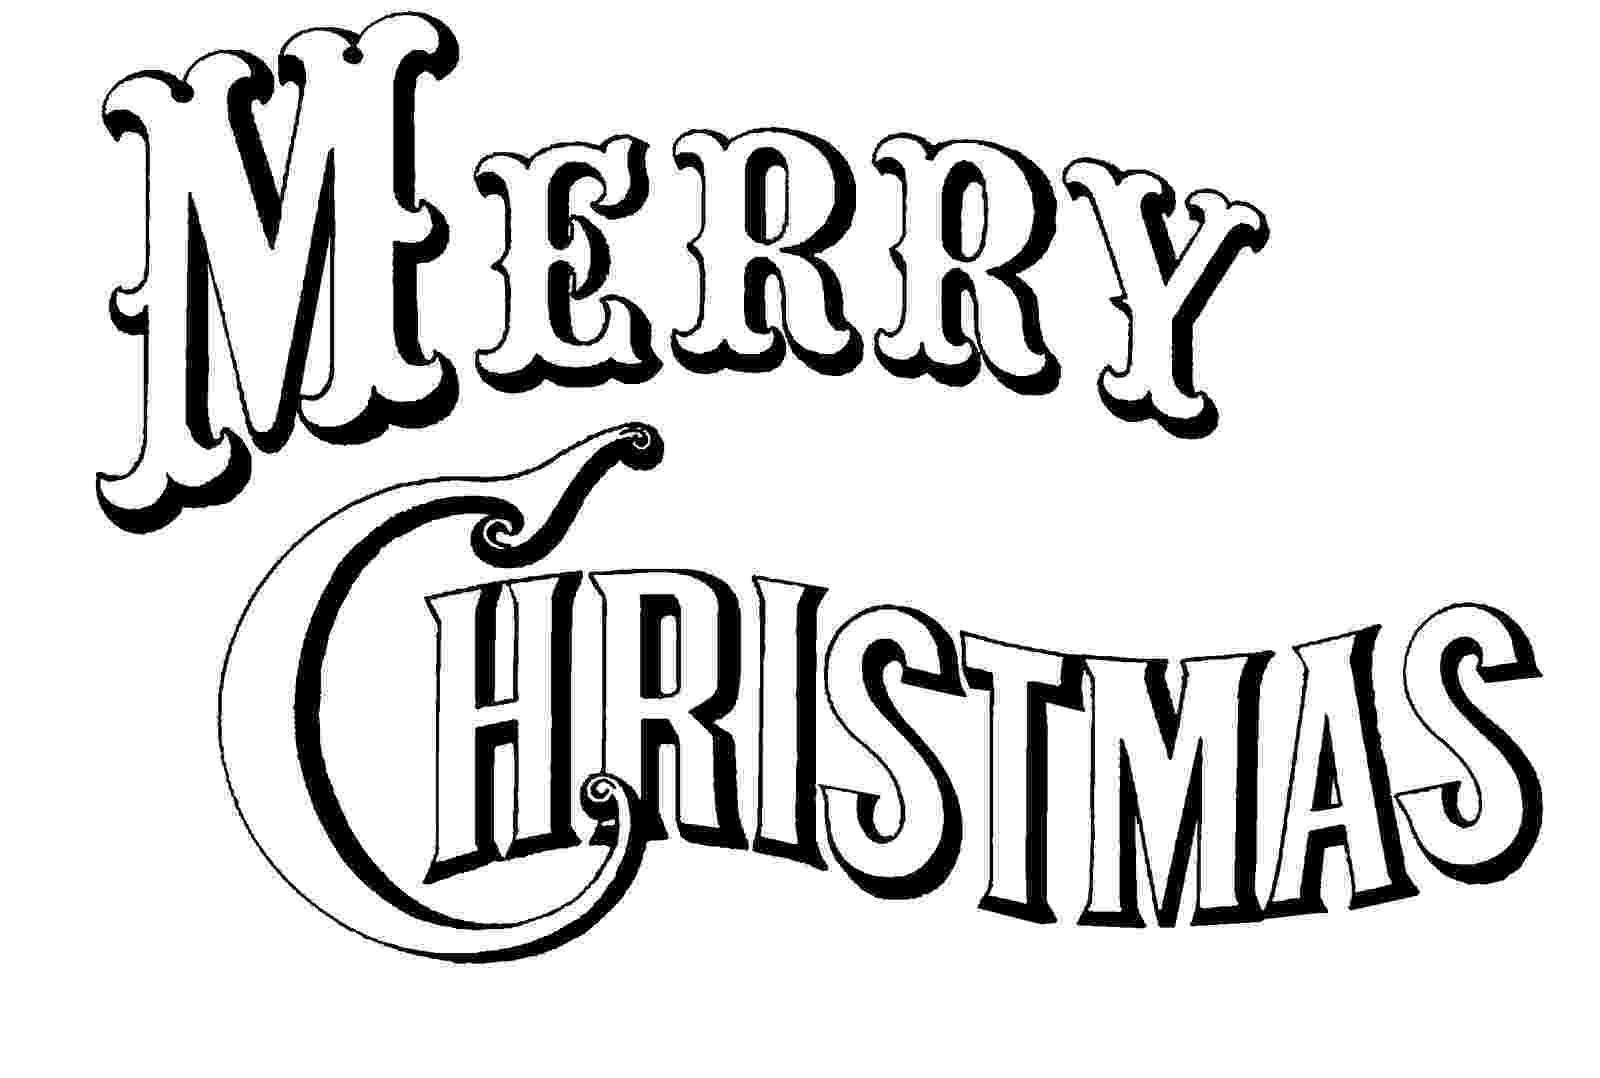 merry christmas coloring sheet free printable merry christmas coloring pages coloring christmas sheet merry